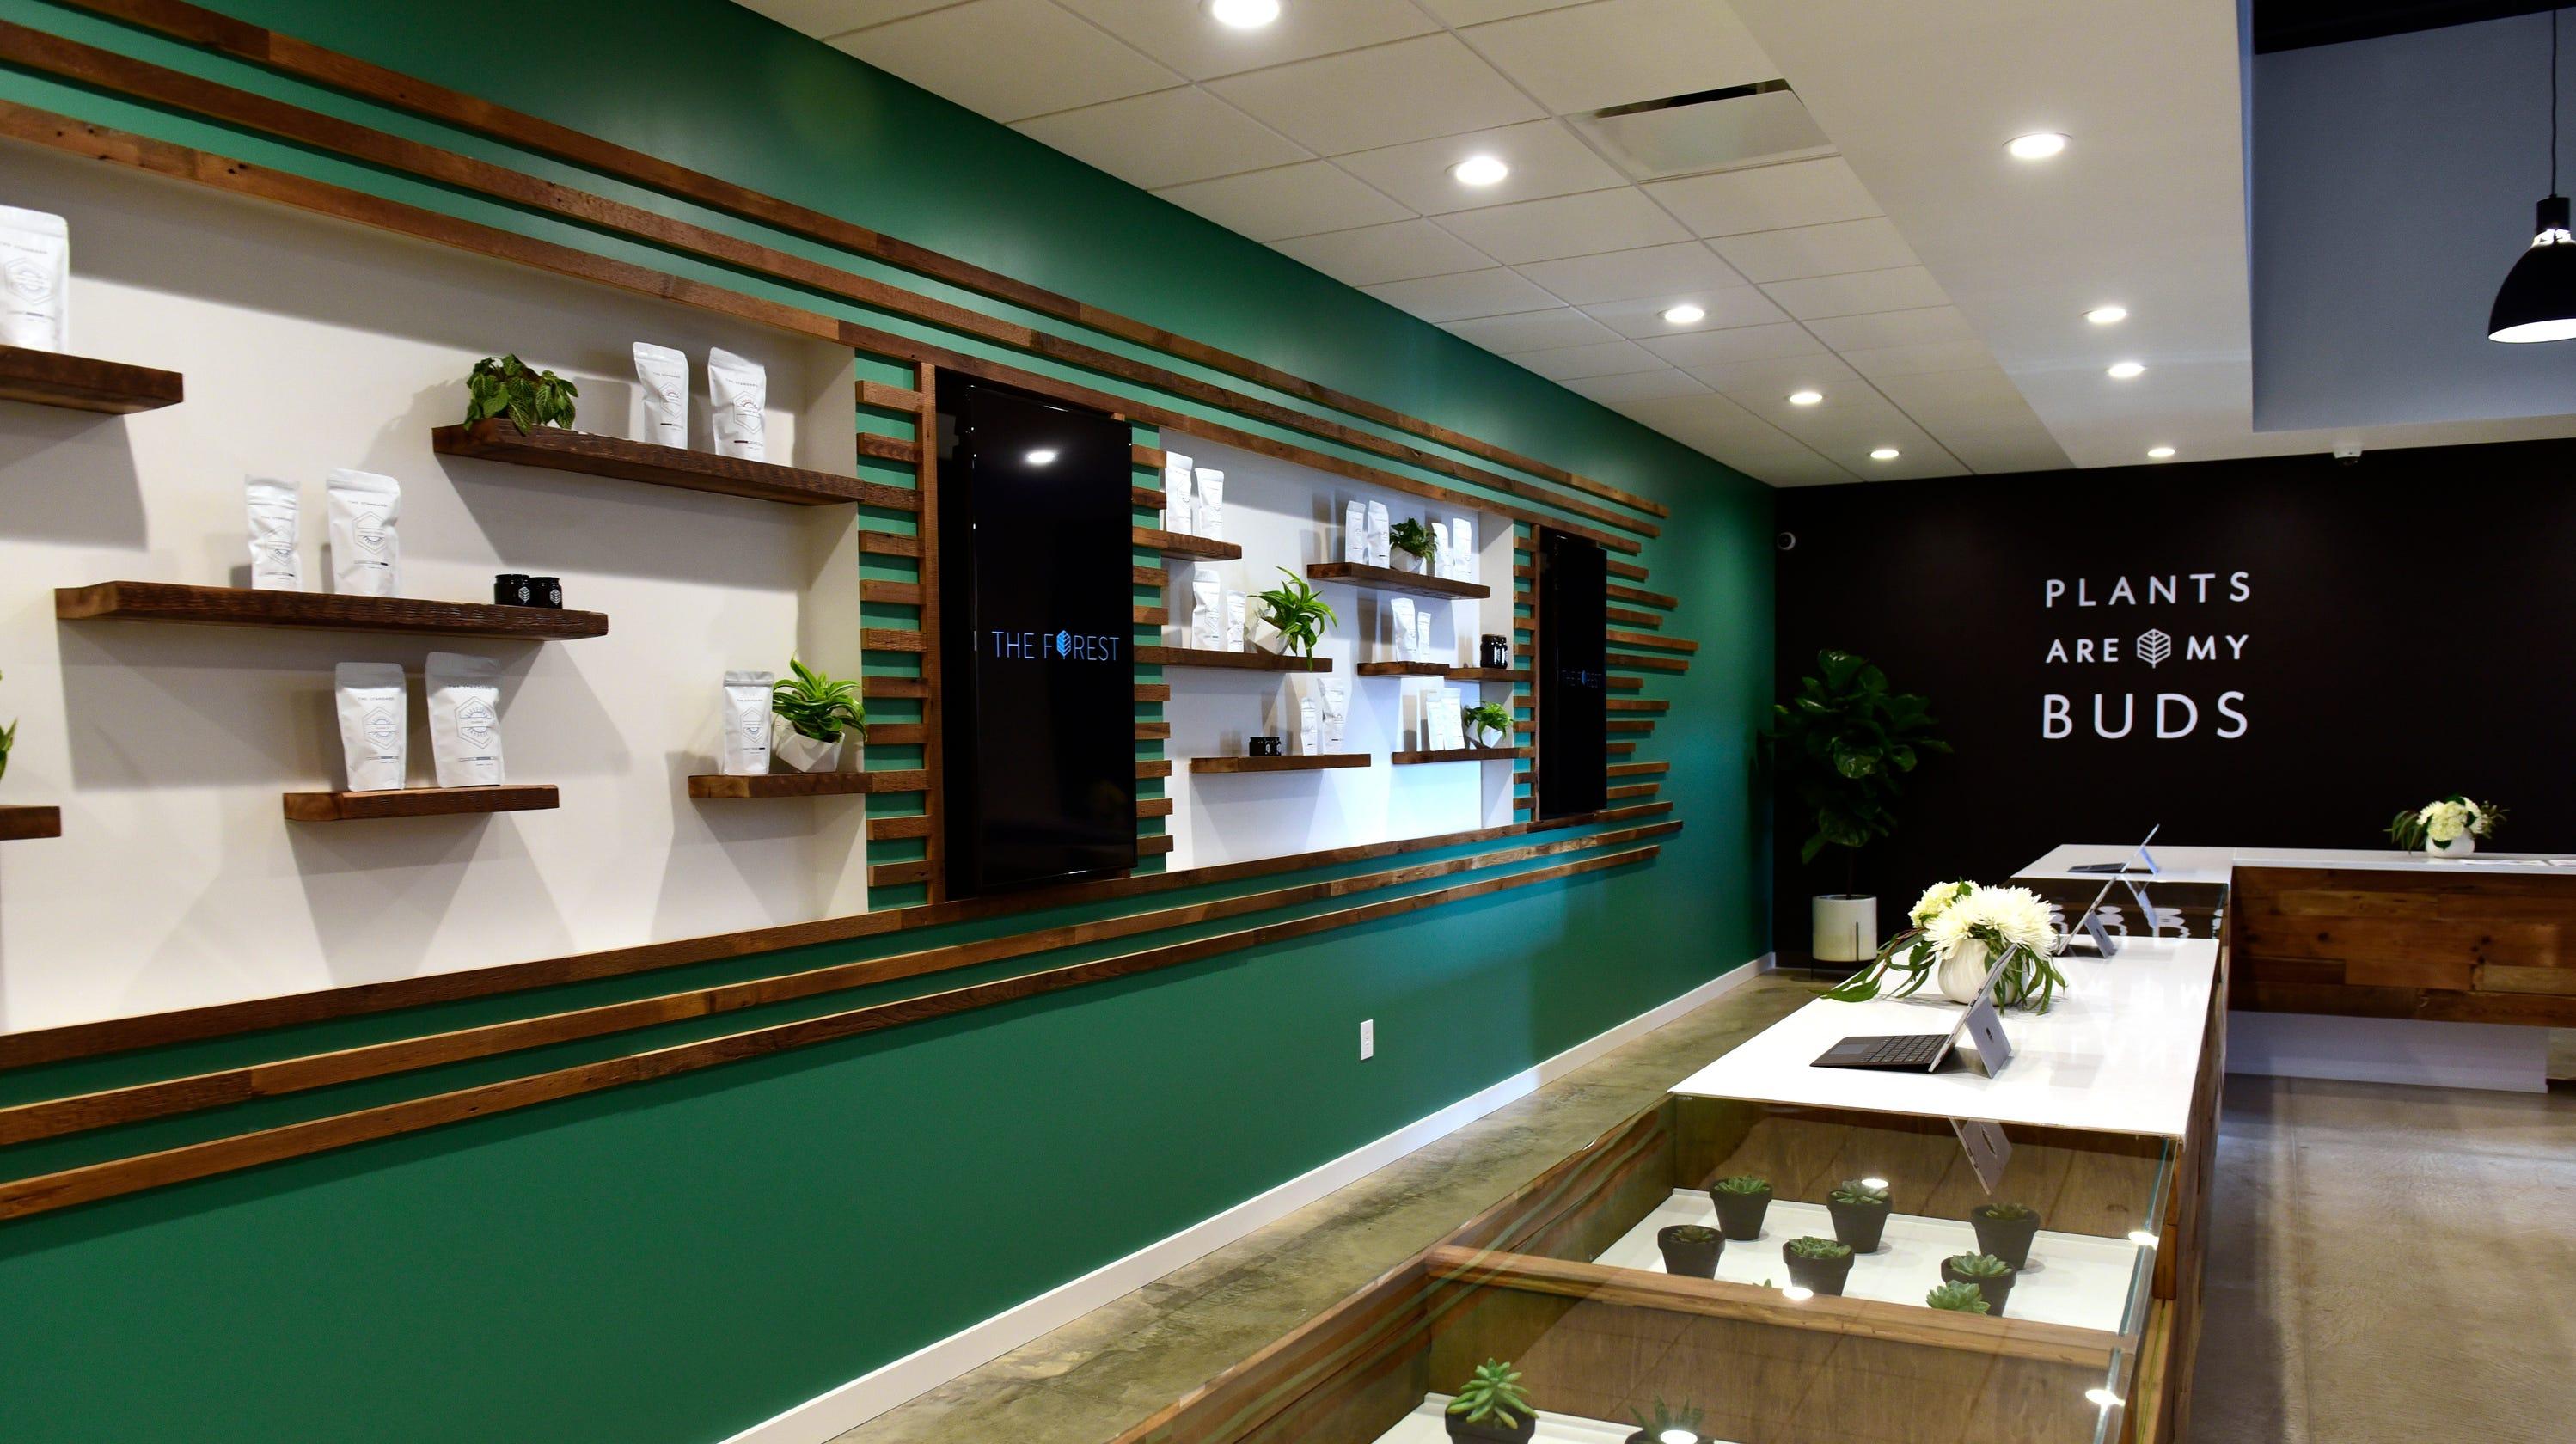 How to visit an Ohio medical marijuana dispensary